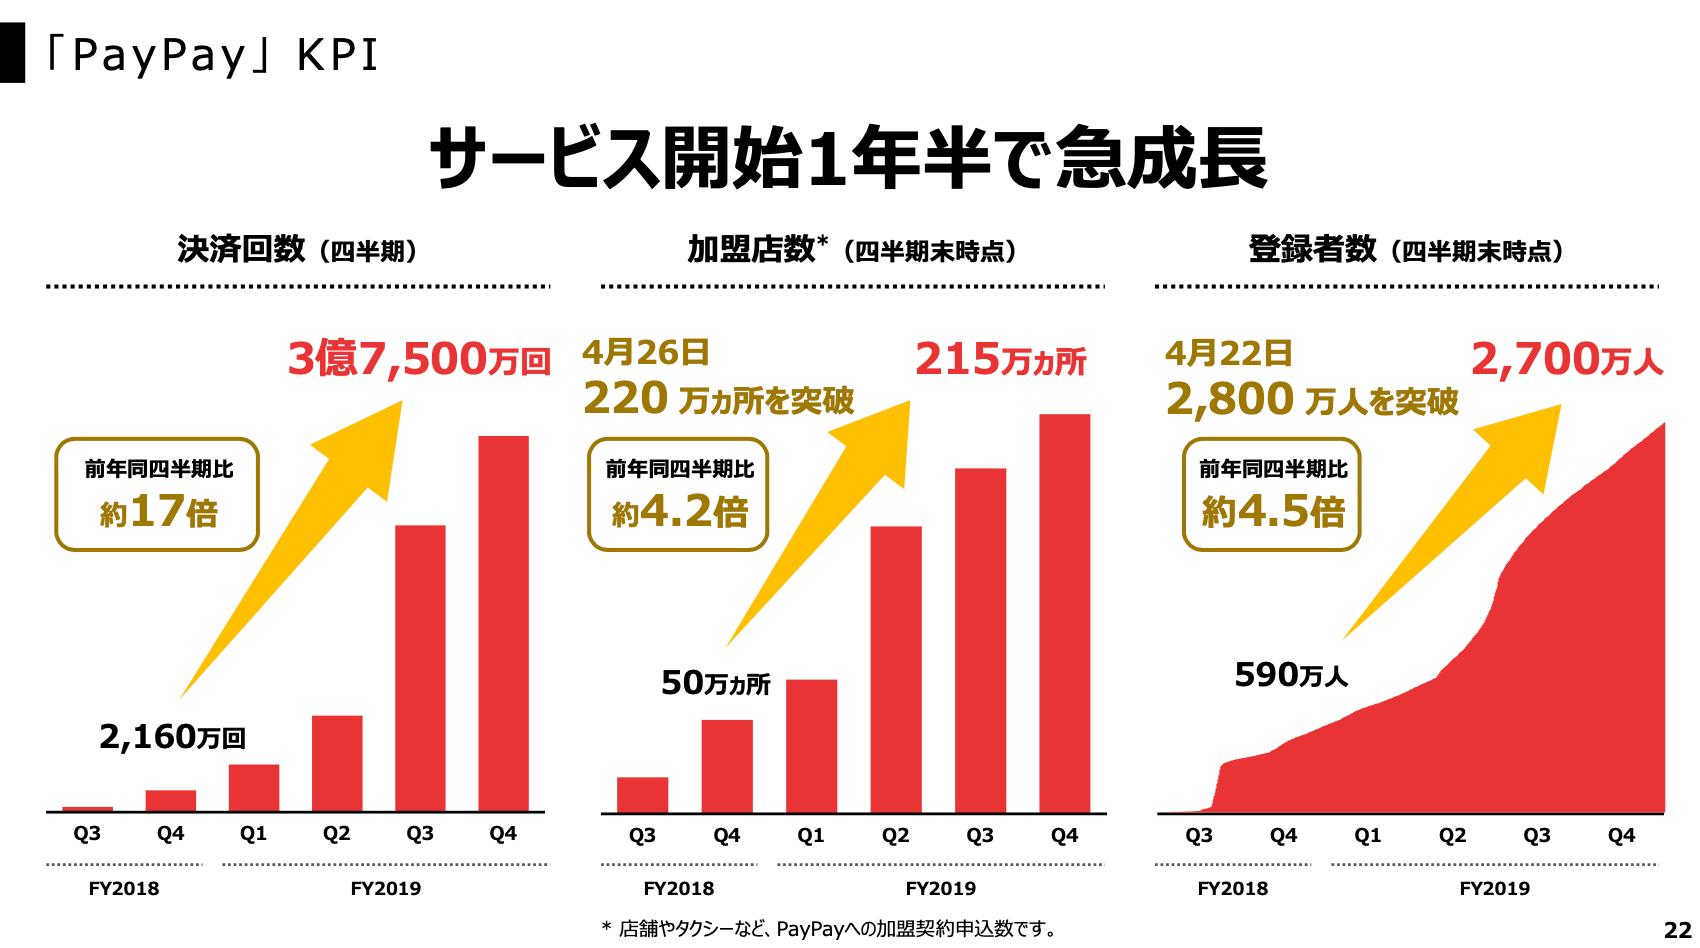 PayPayの売上・営業利益推移【利用者数・決済回数・ユーザー数】2